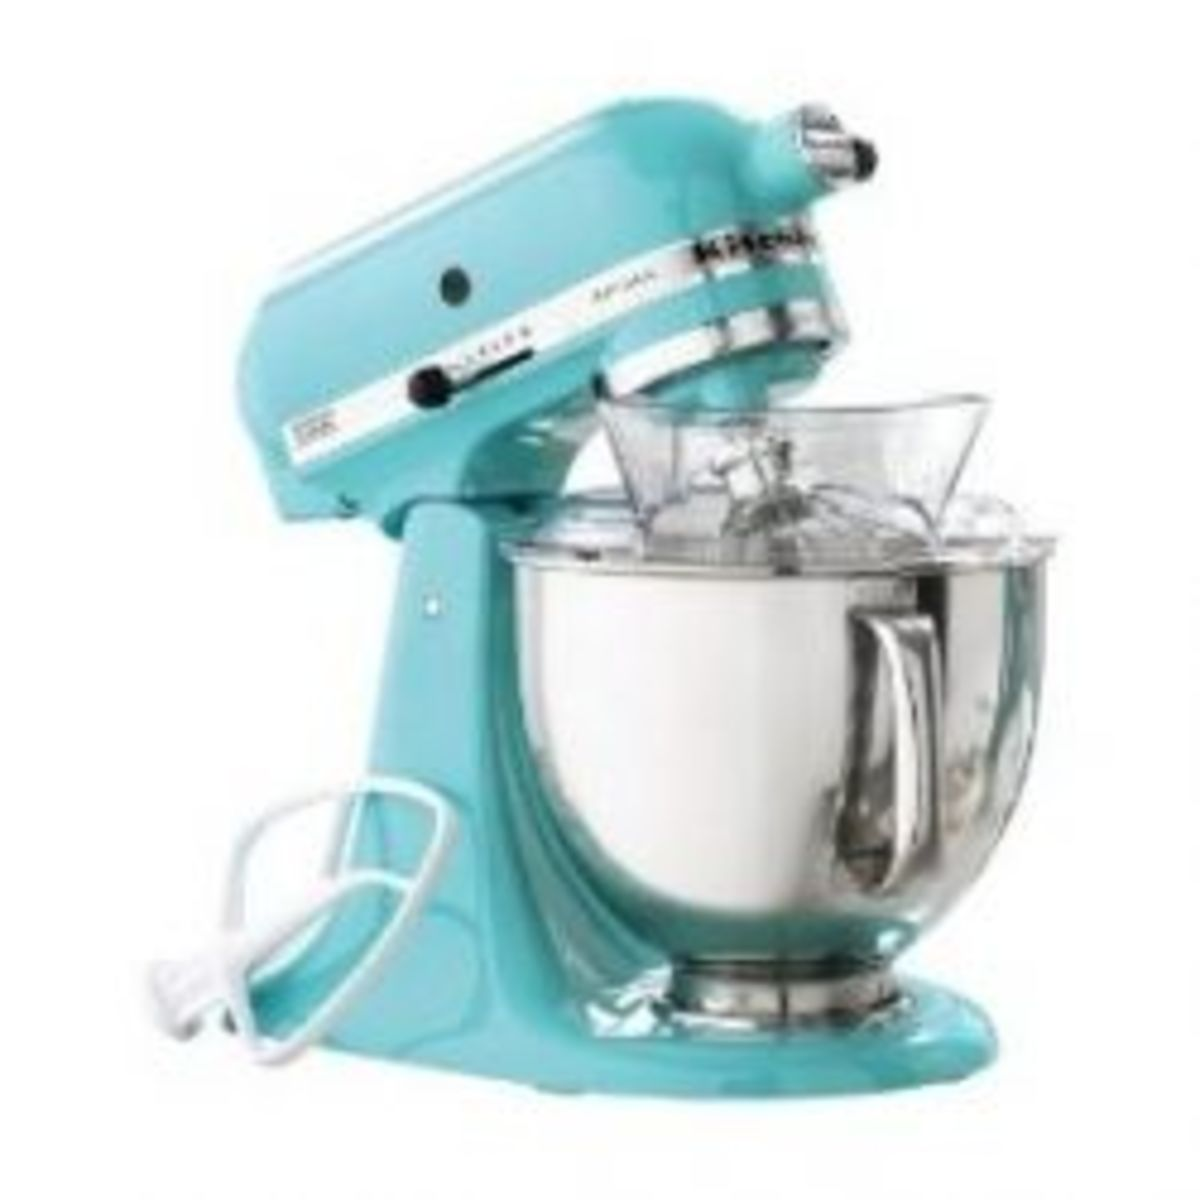 kitchenaid artisan martha stewart 5 qt stand mixer a review hubpages - Kitchenaid Artisan 5qt Stand Mixer